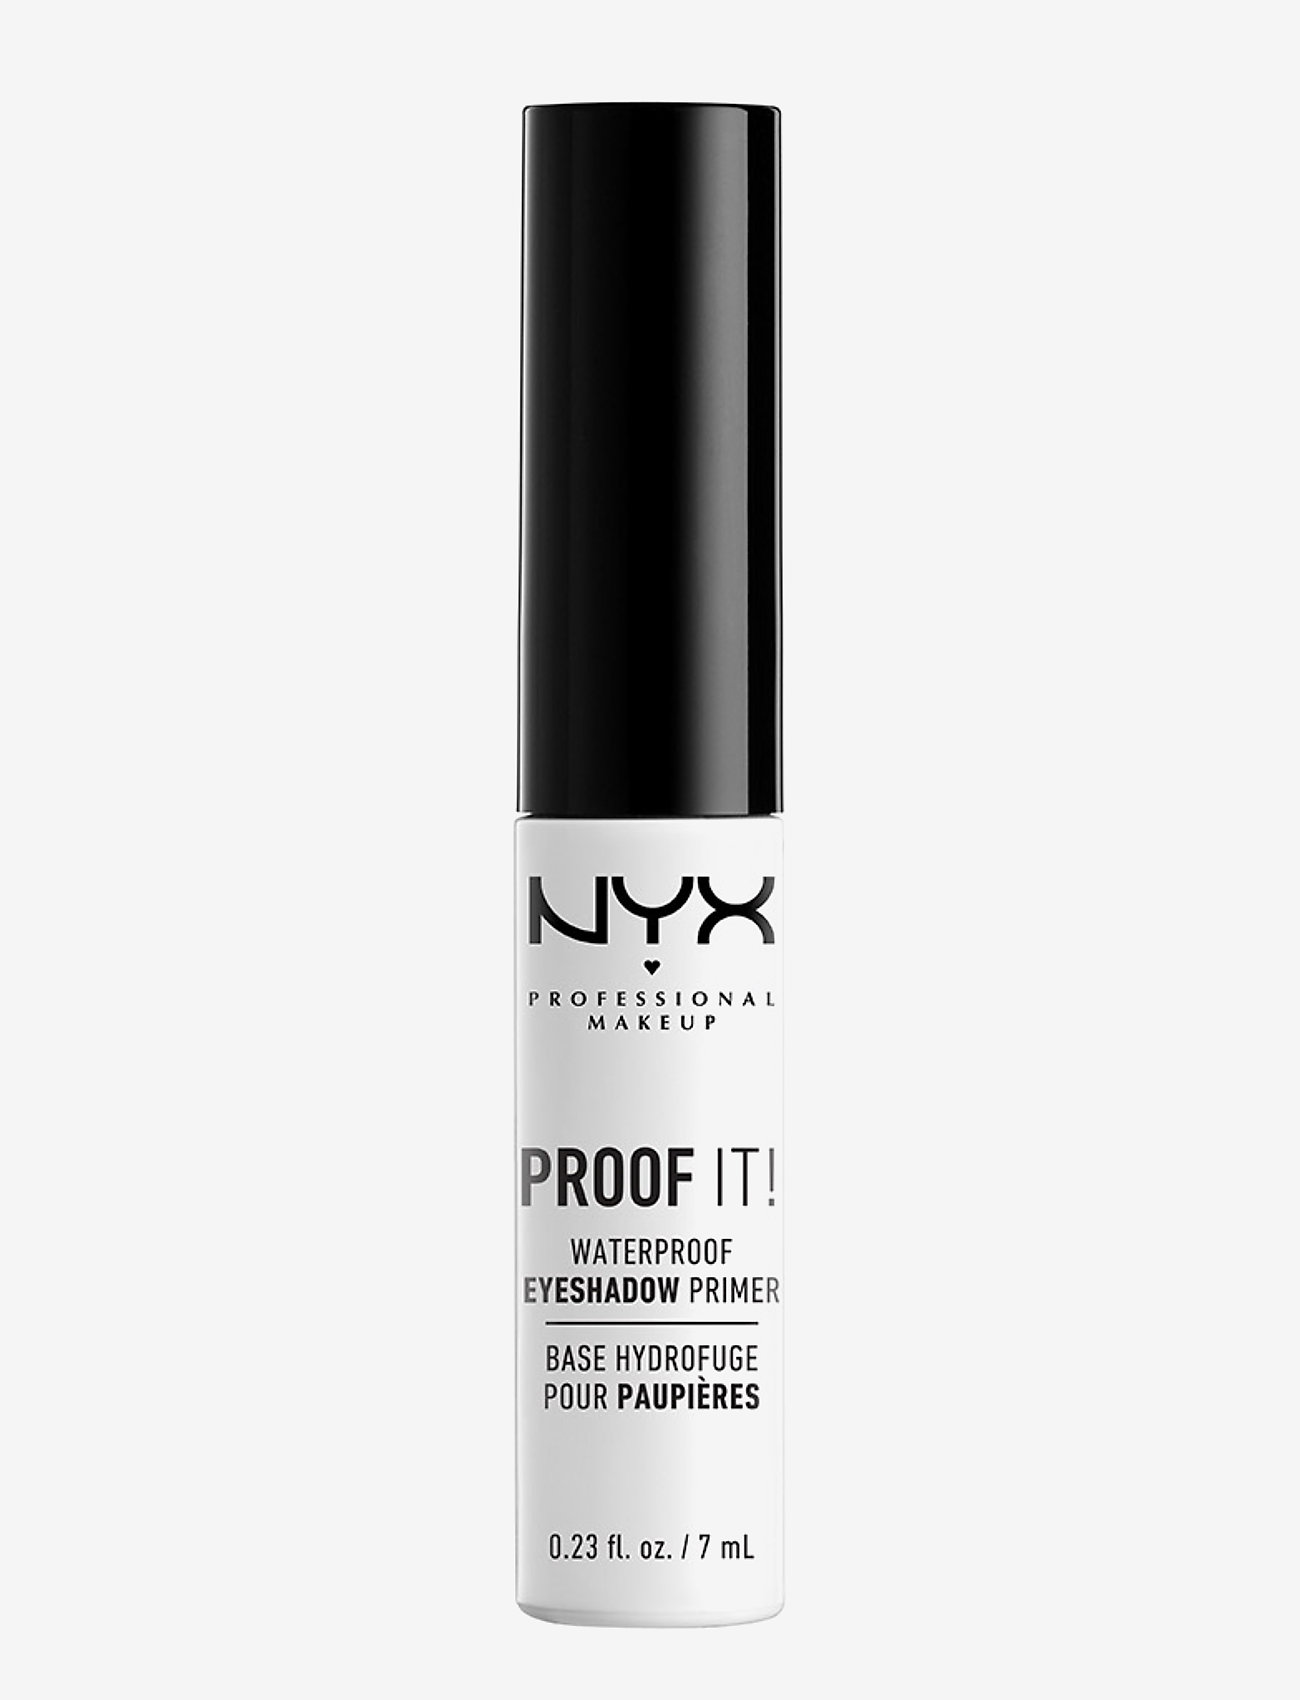 NYX PROFESSIONAL MAKEUP - PROOF IT! - WATERPROOF EYE SHADOW PRIMER - clear - 0